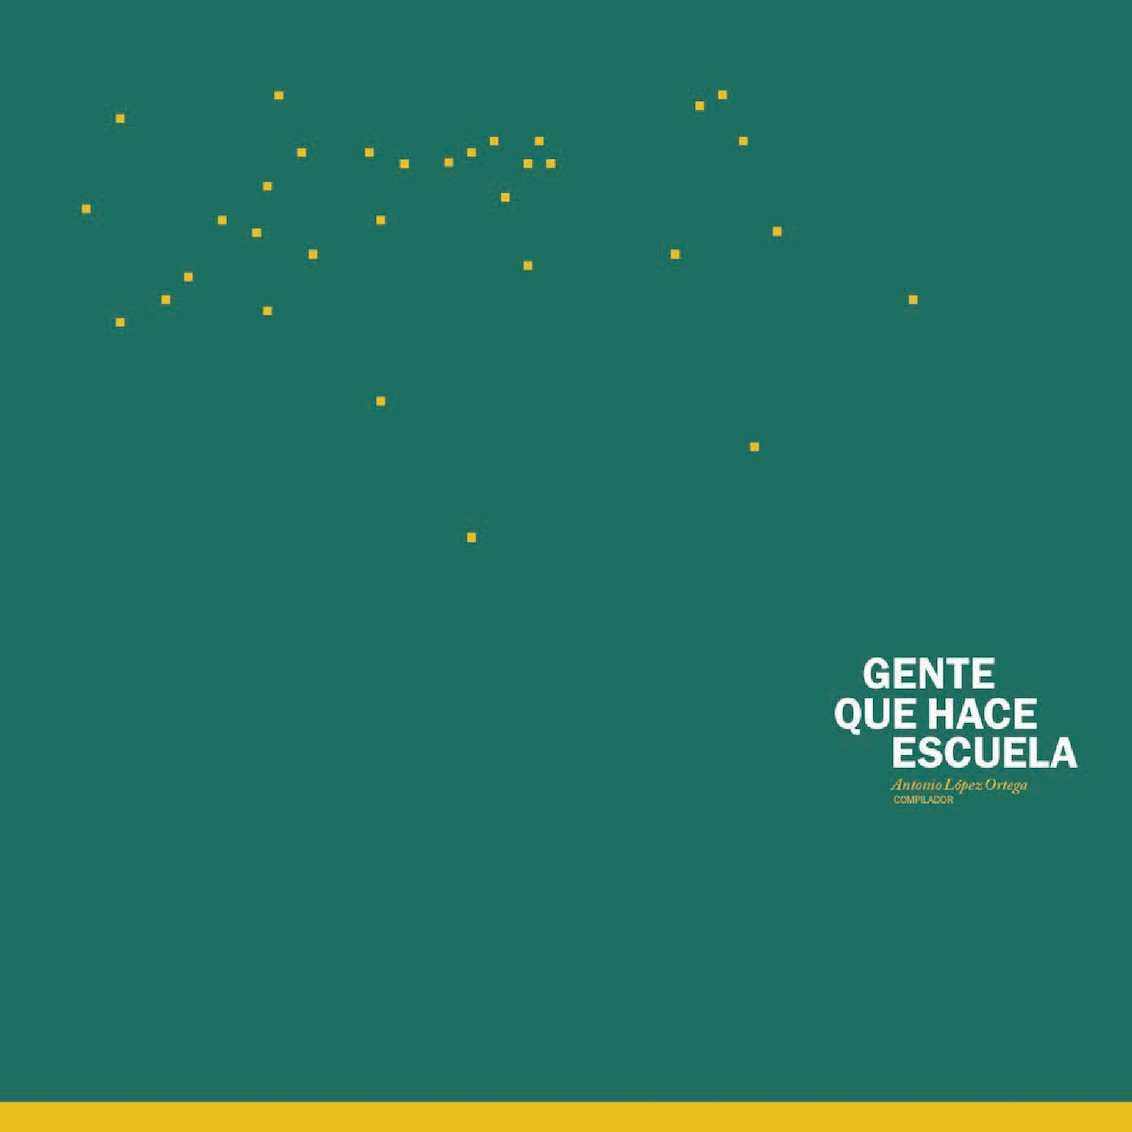 Calaméo - Banesco Libro Gente Que Hace Escuela Copia 063a3f9fe32b